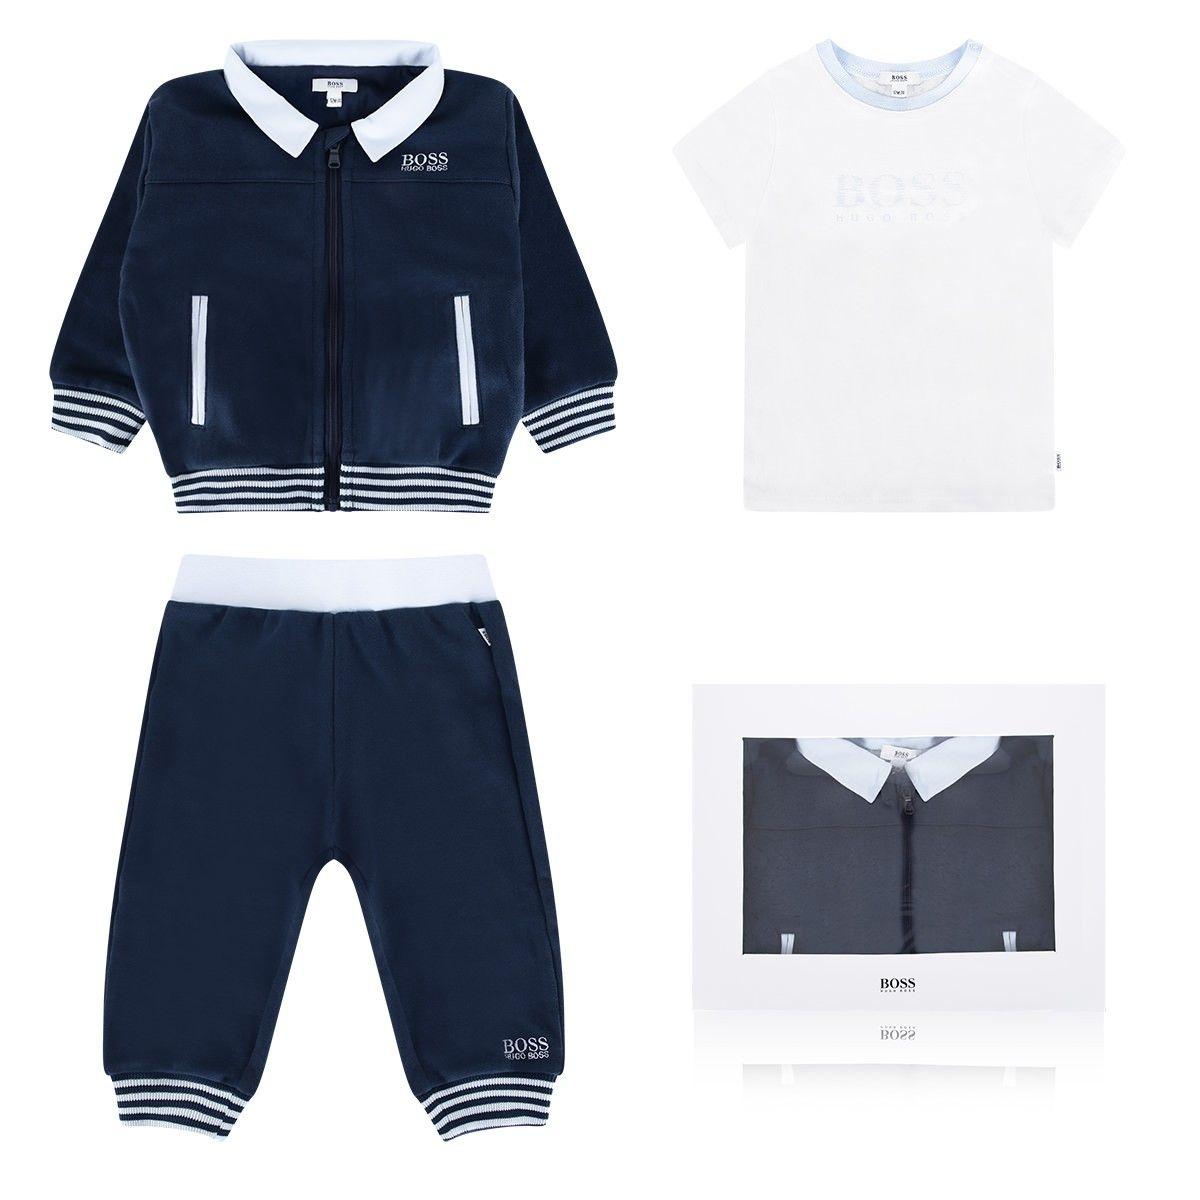 89a3999d328f BOSS Baby Boys Navy Tracksuit   Jersey Top Gift Set (3 Piece ...